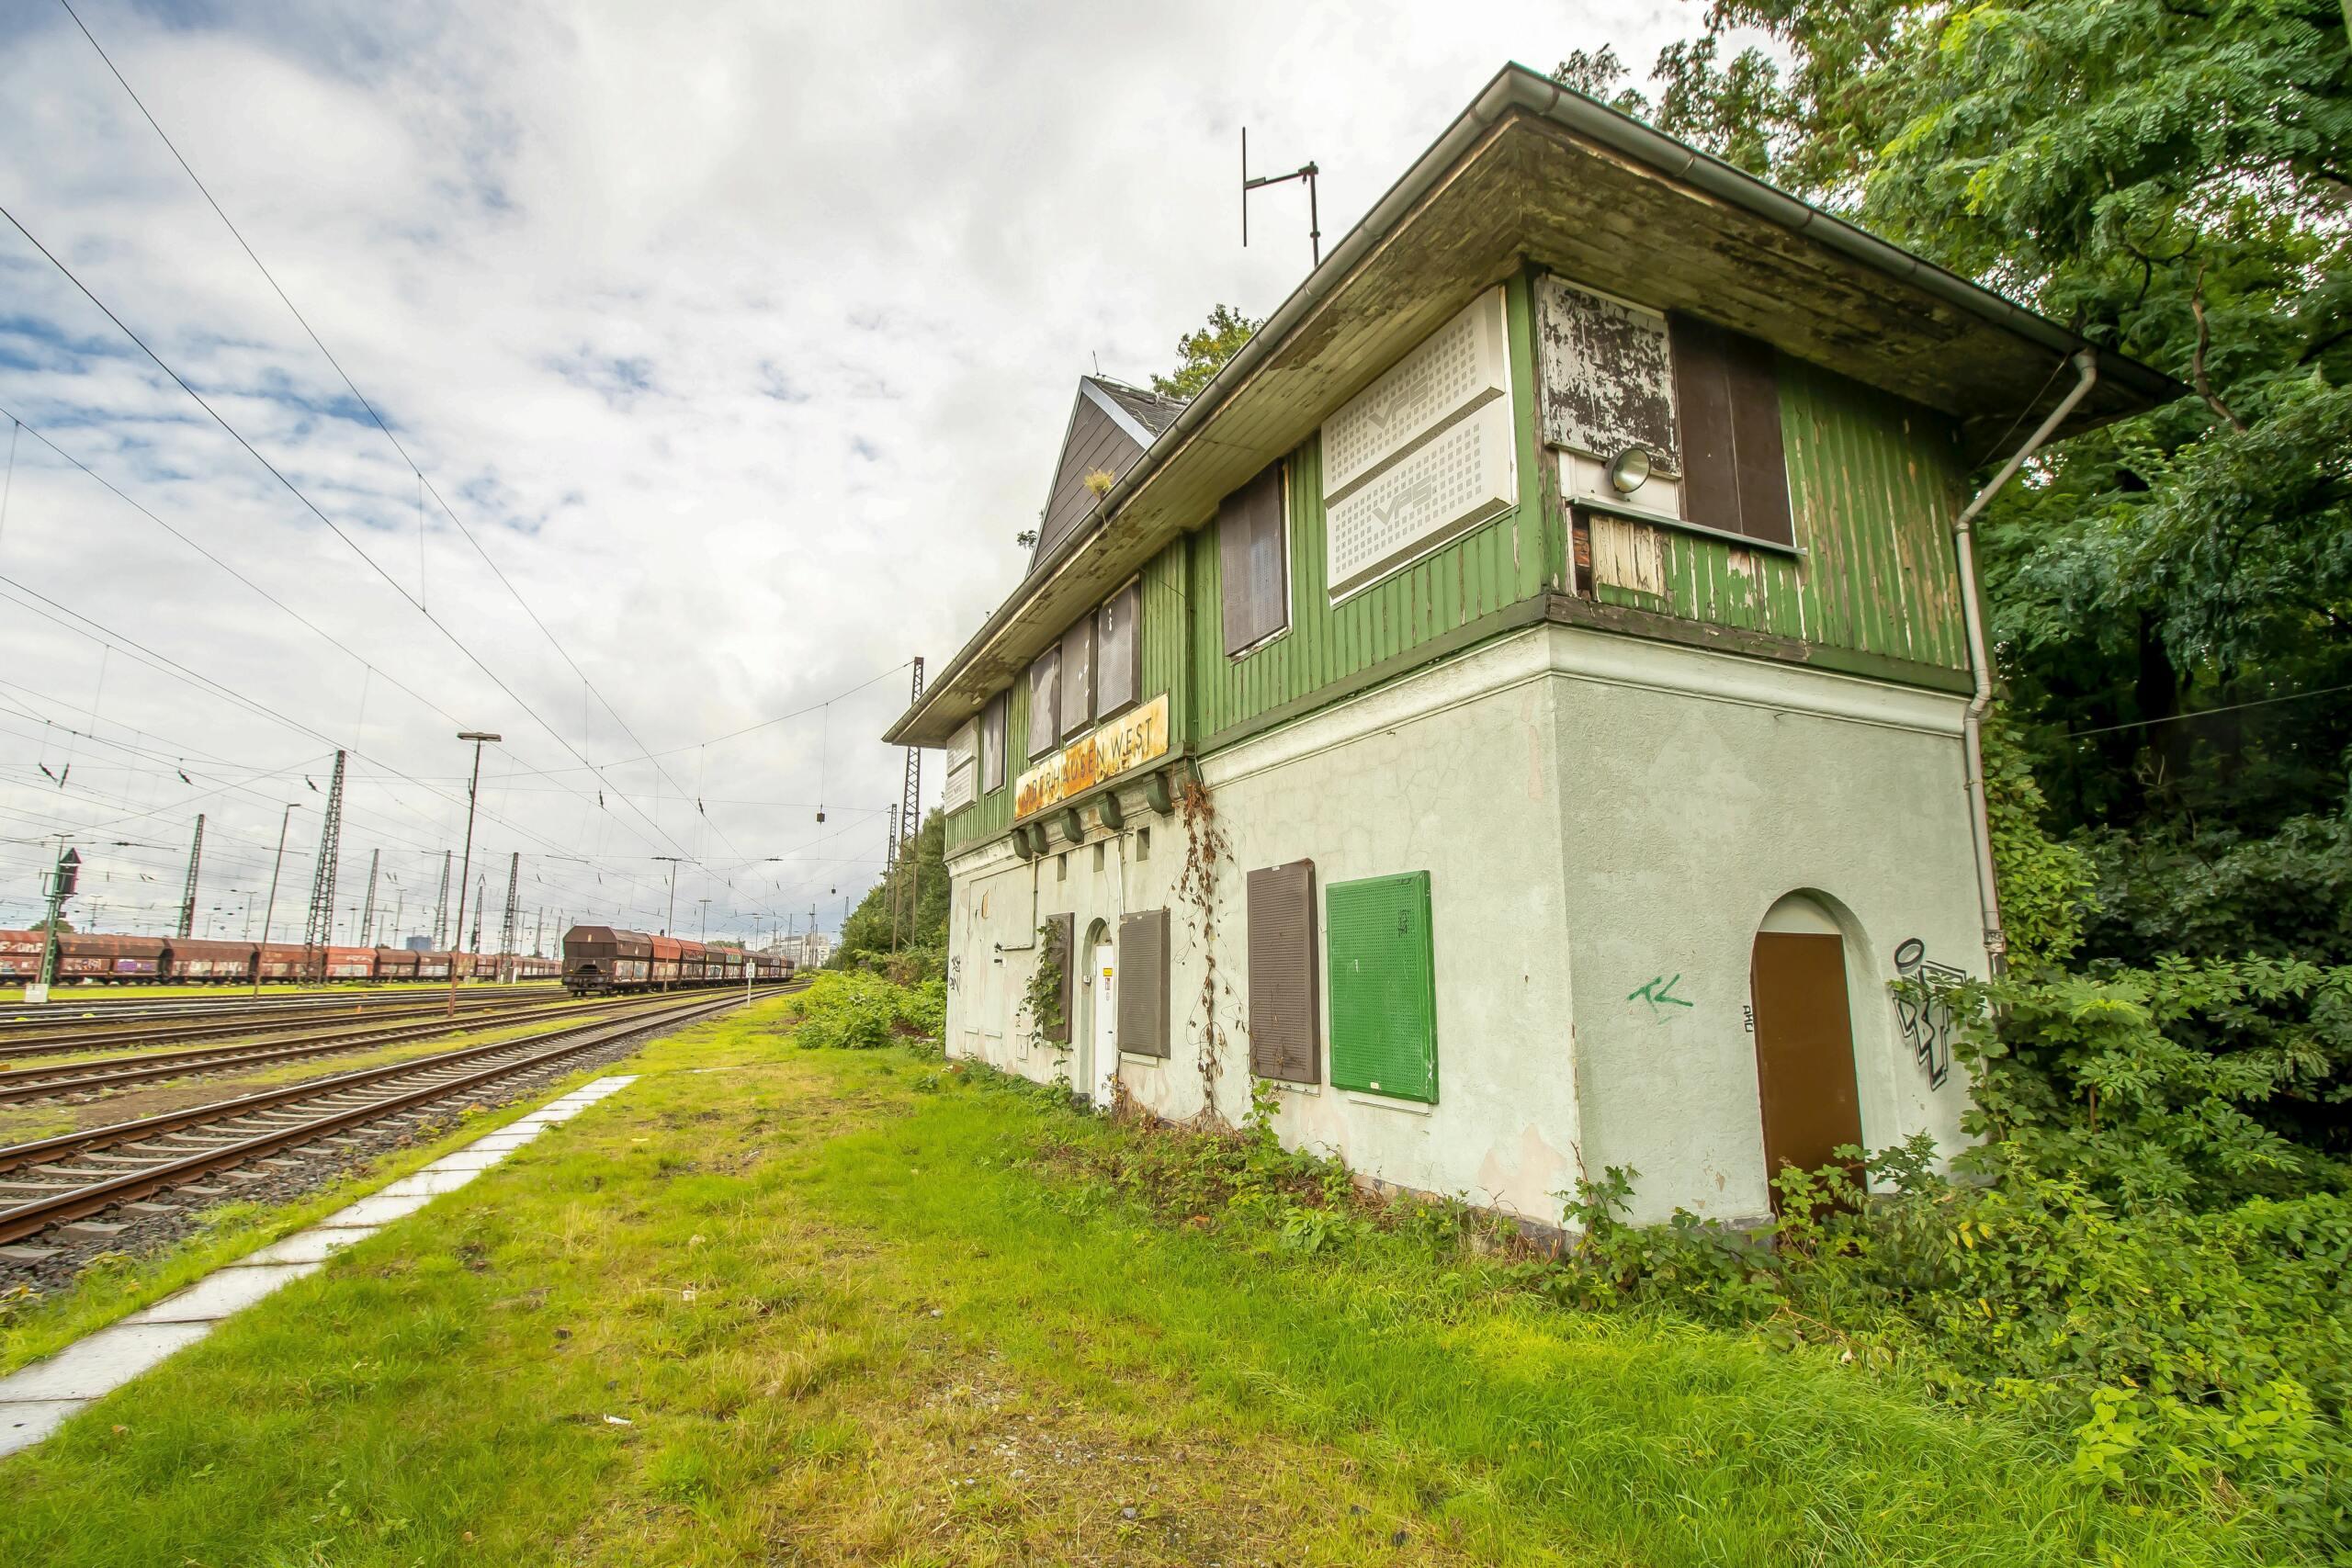 Stellwerk Oberhausen West 242